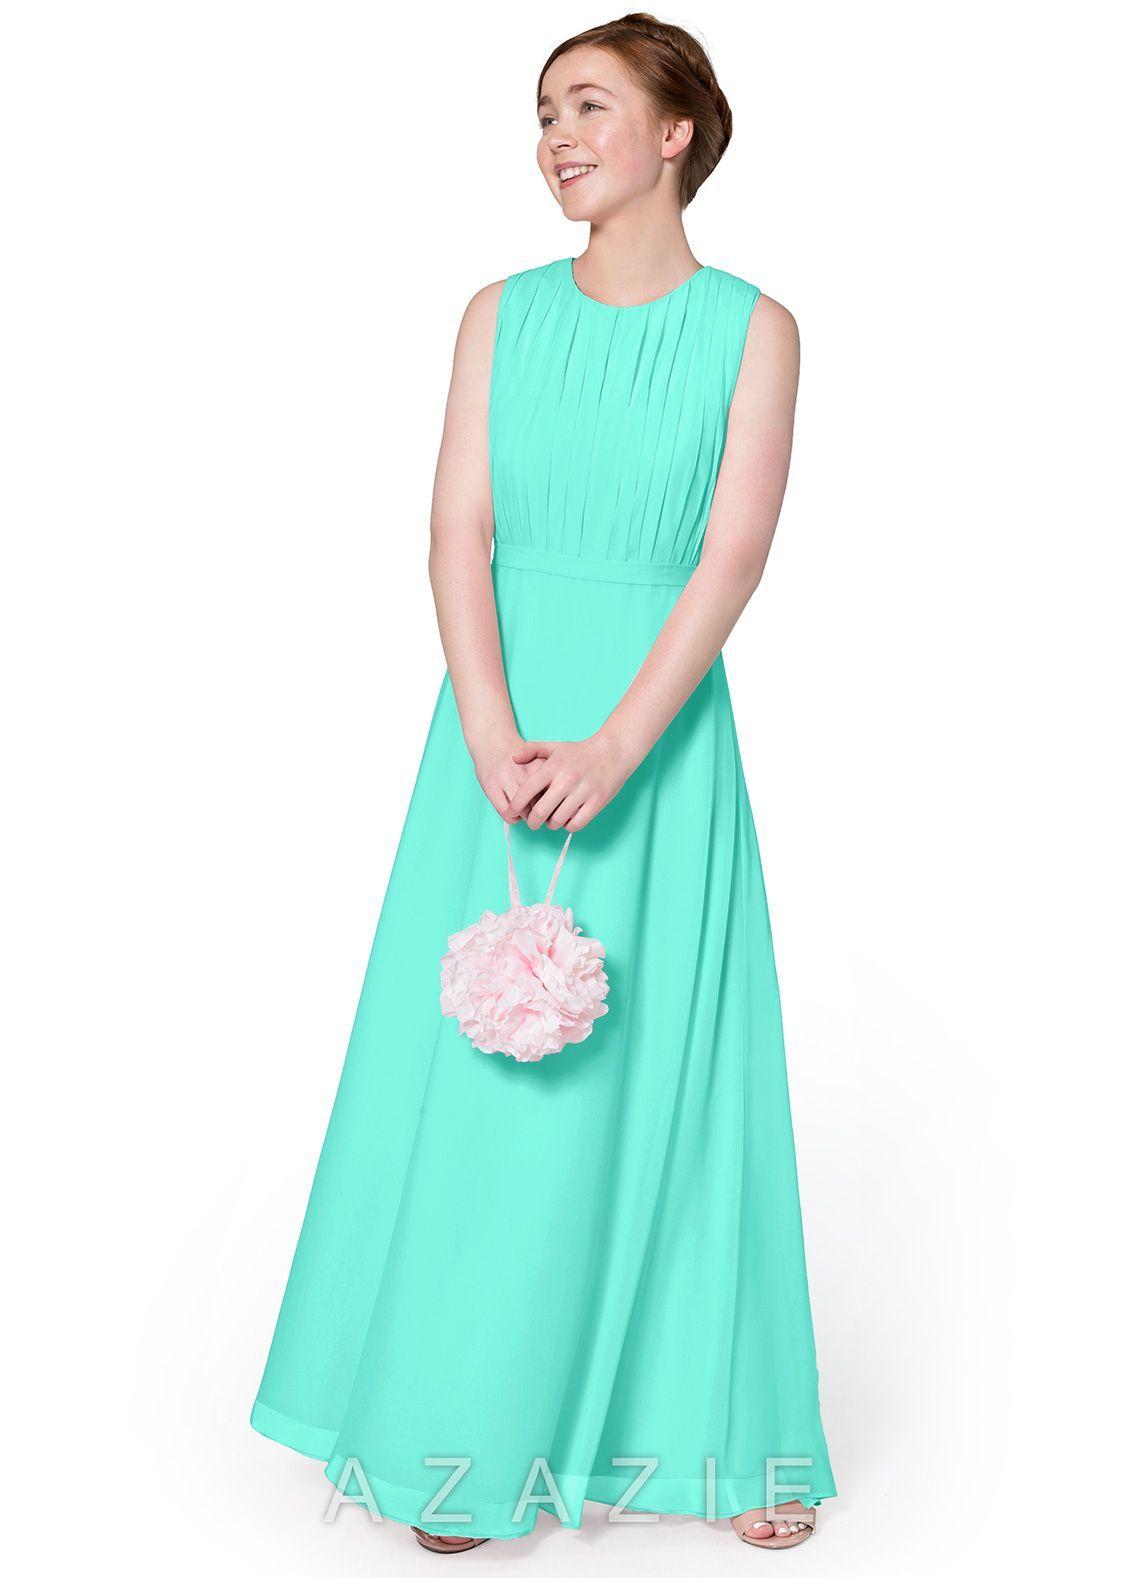 f25eb5e8b Ruby JBD | things i want to buy | Flower girl dresses, Junior ...